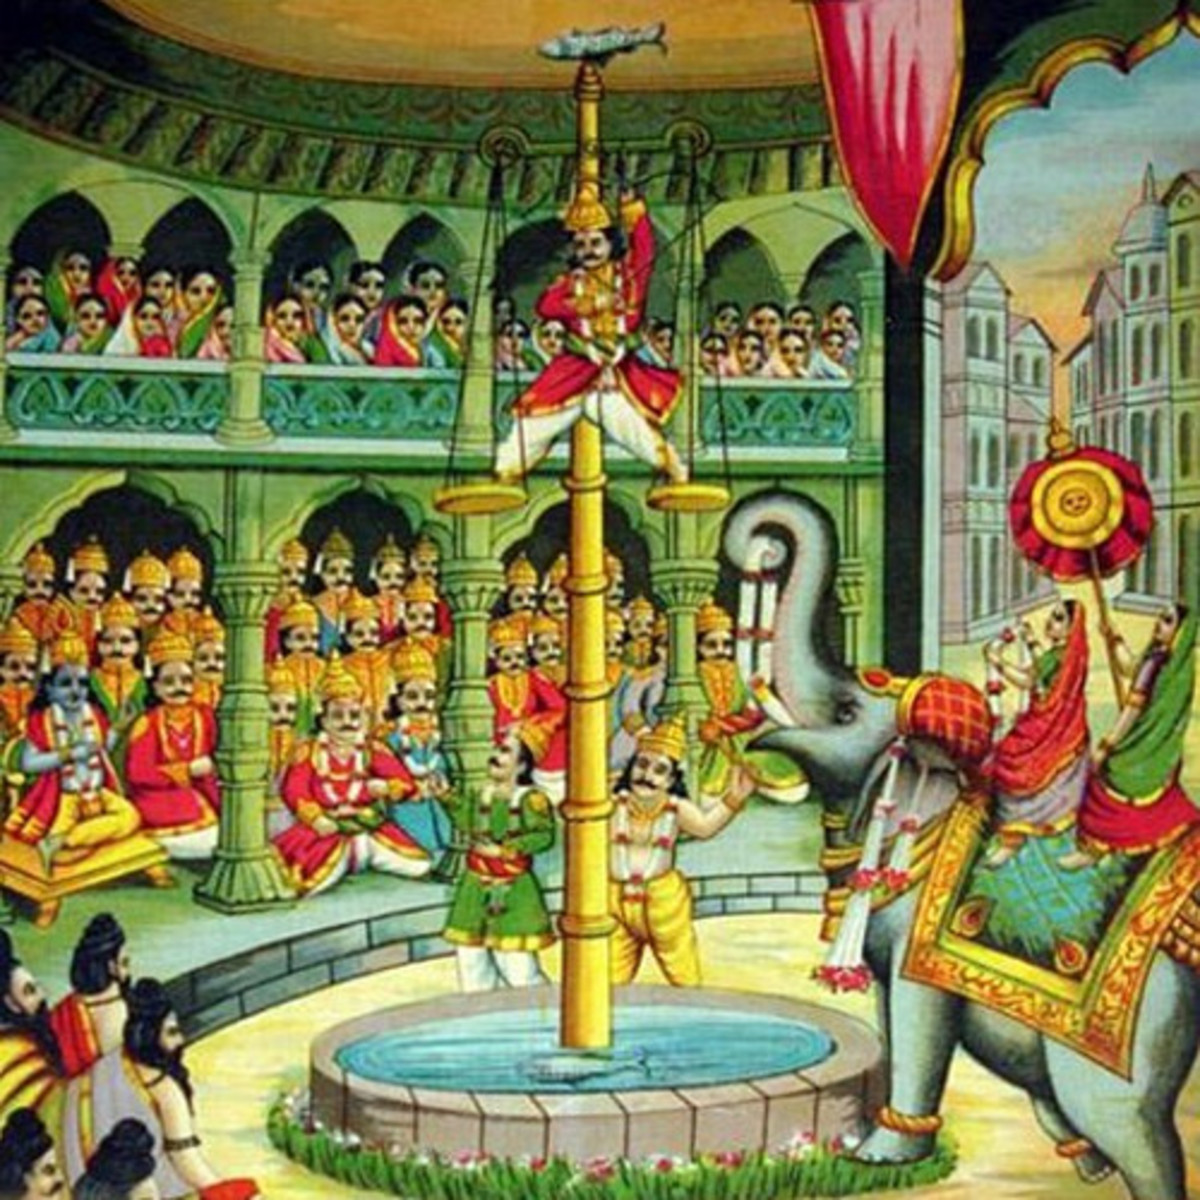 Arjuna's feat of archery won him Panchali (Draupadi) as his wife.